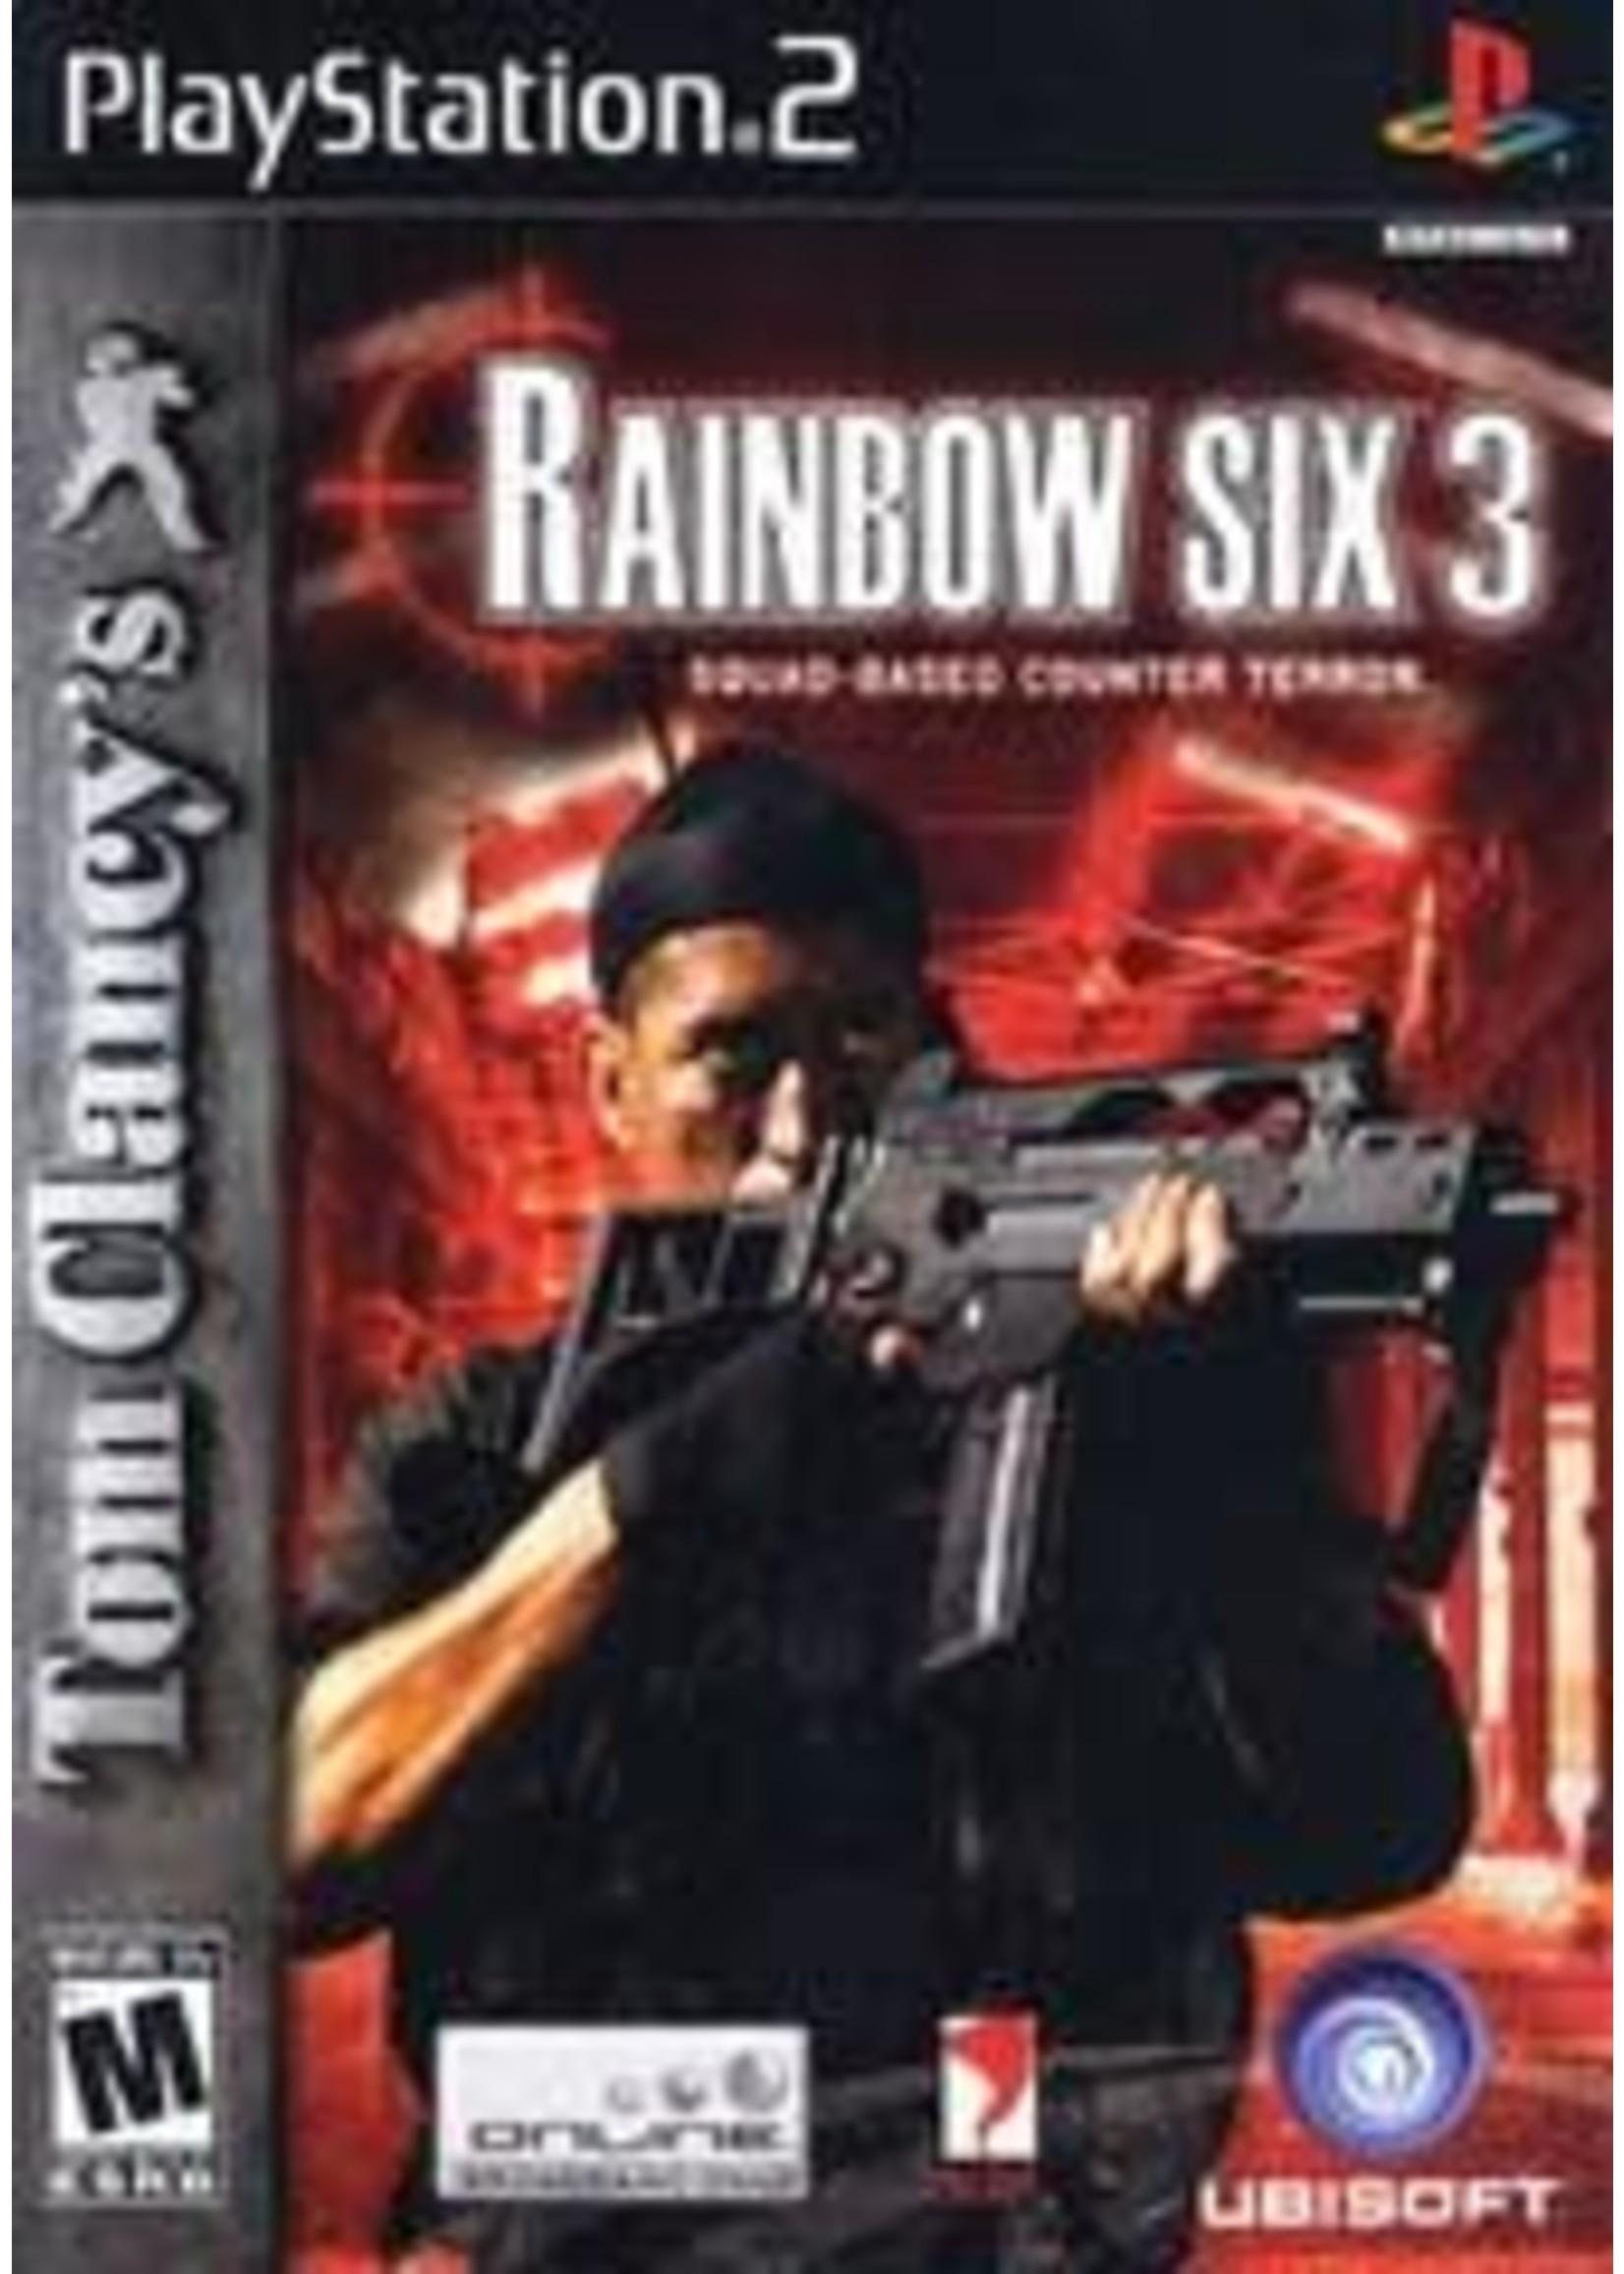 Rainbow Six 3 Playstation 2